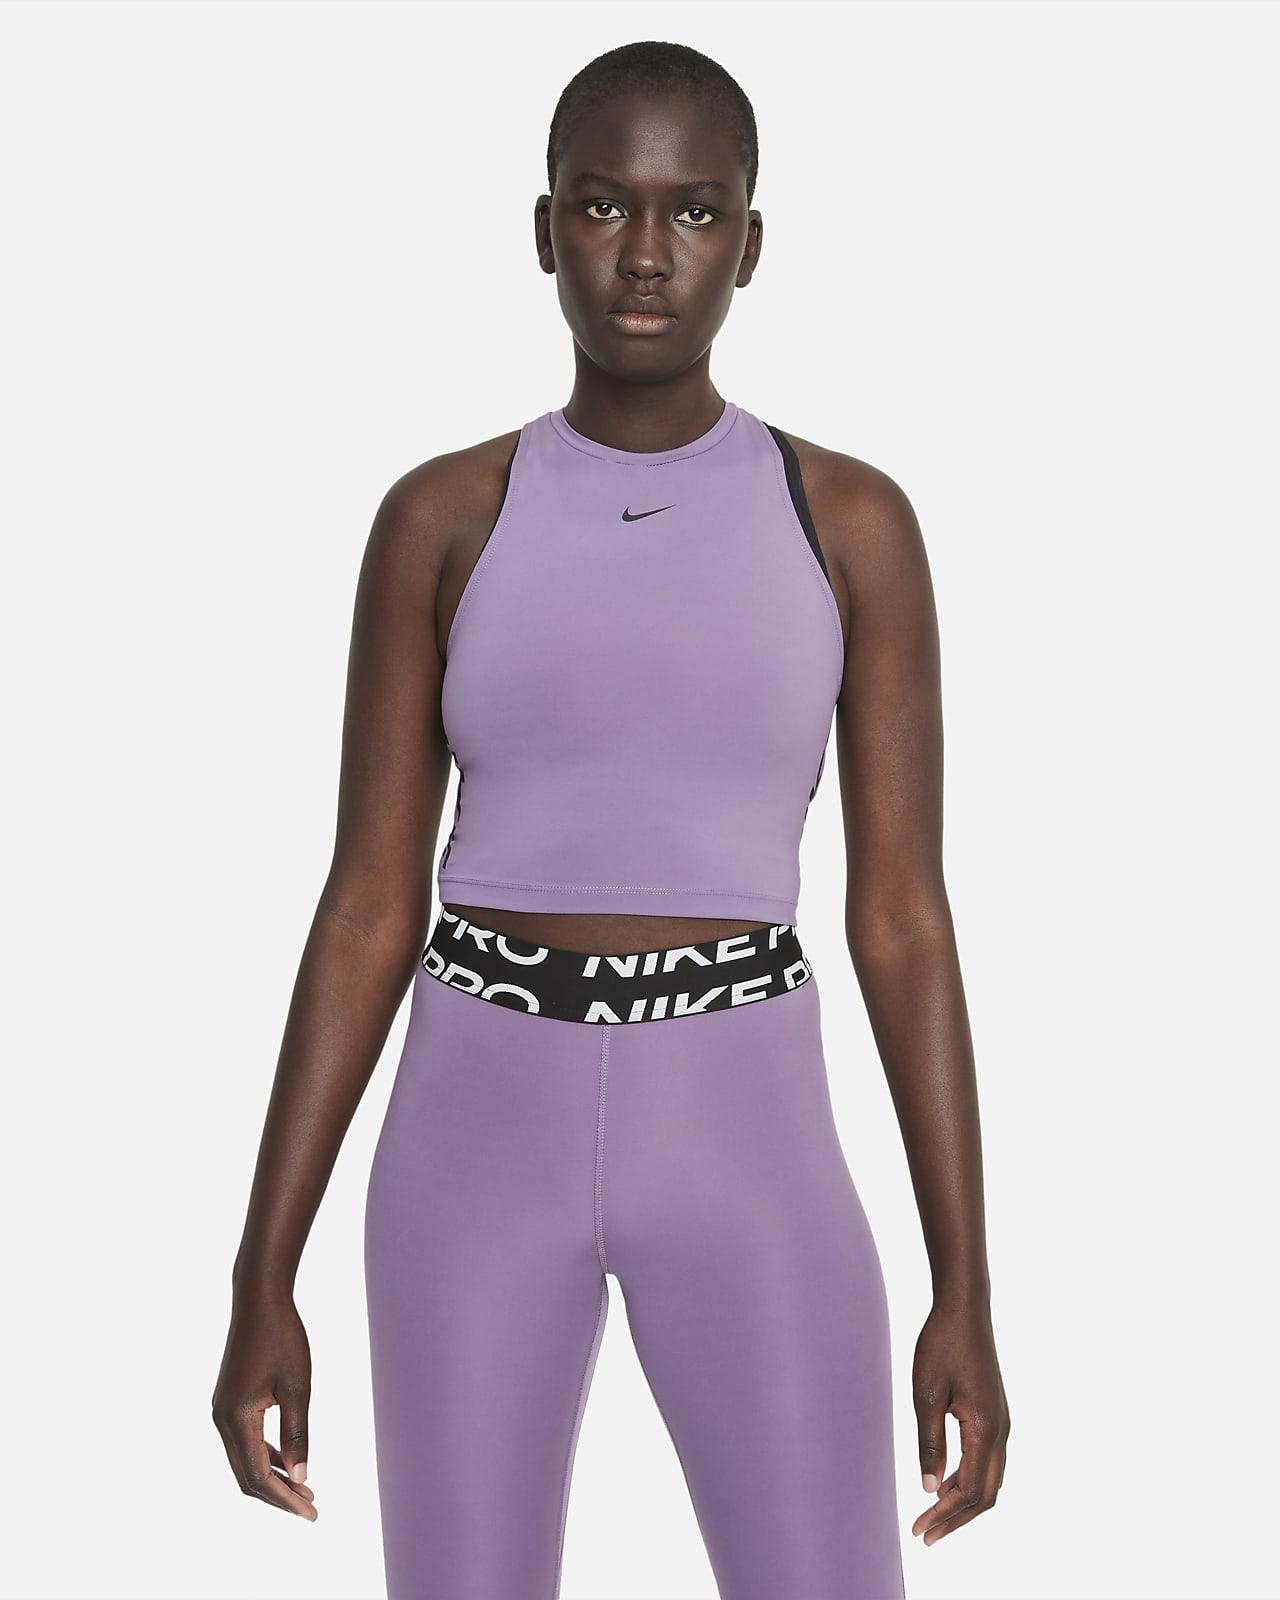 Camiseta de tirantes corta estampada para mujer Nike Pro Dri-FIT